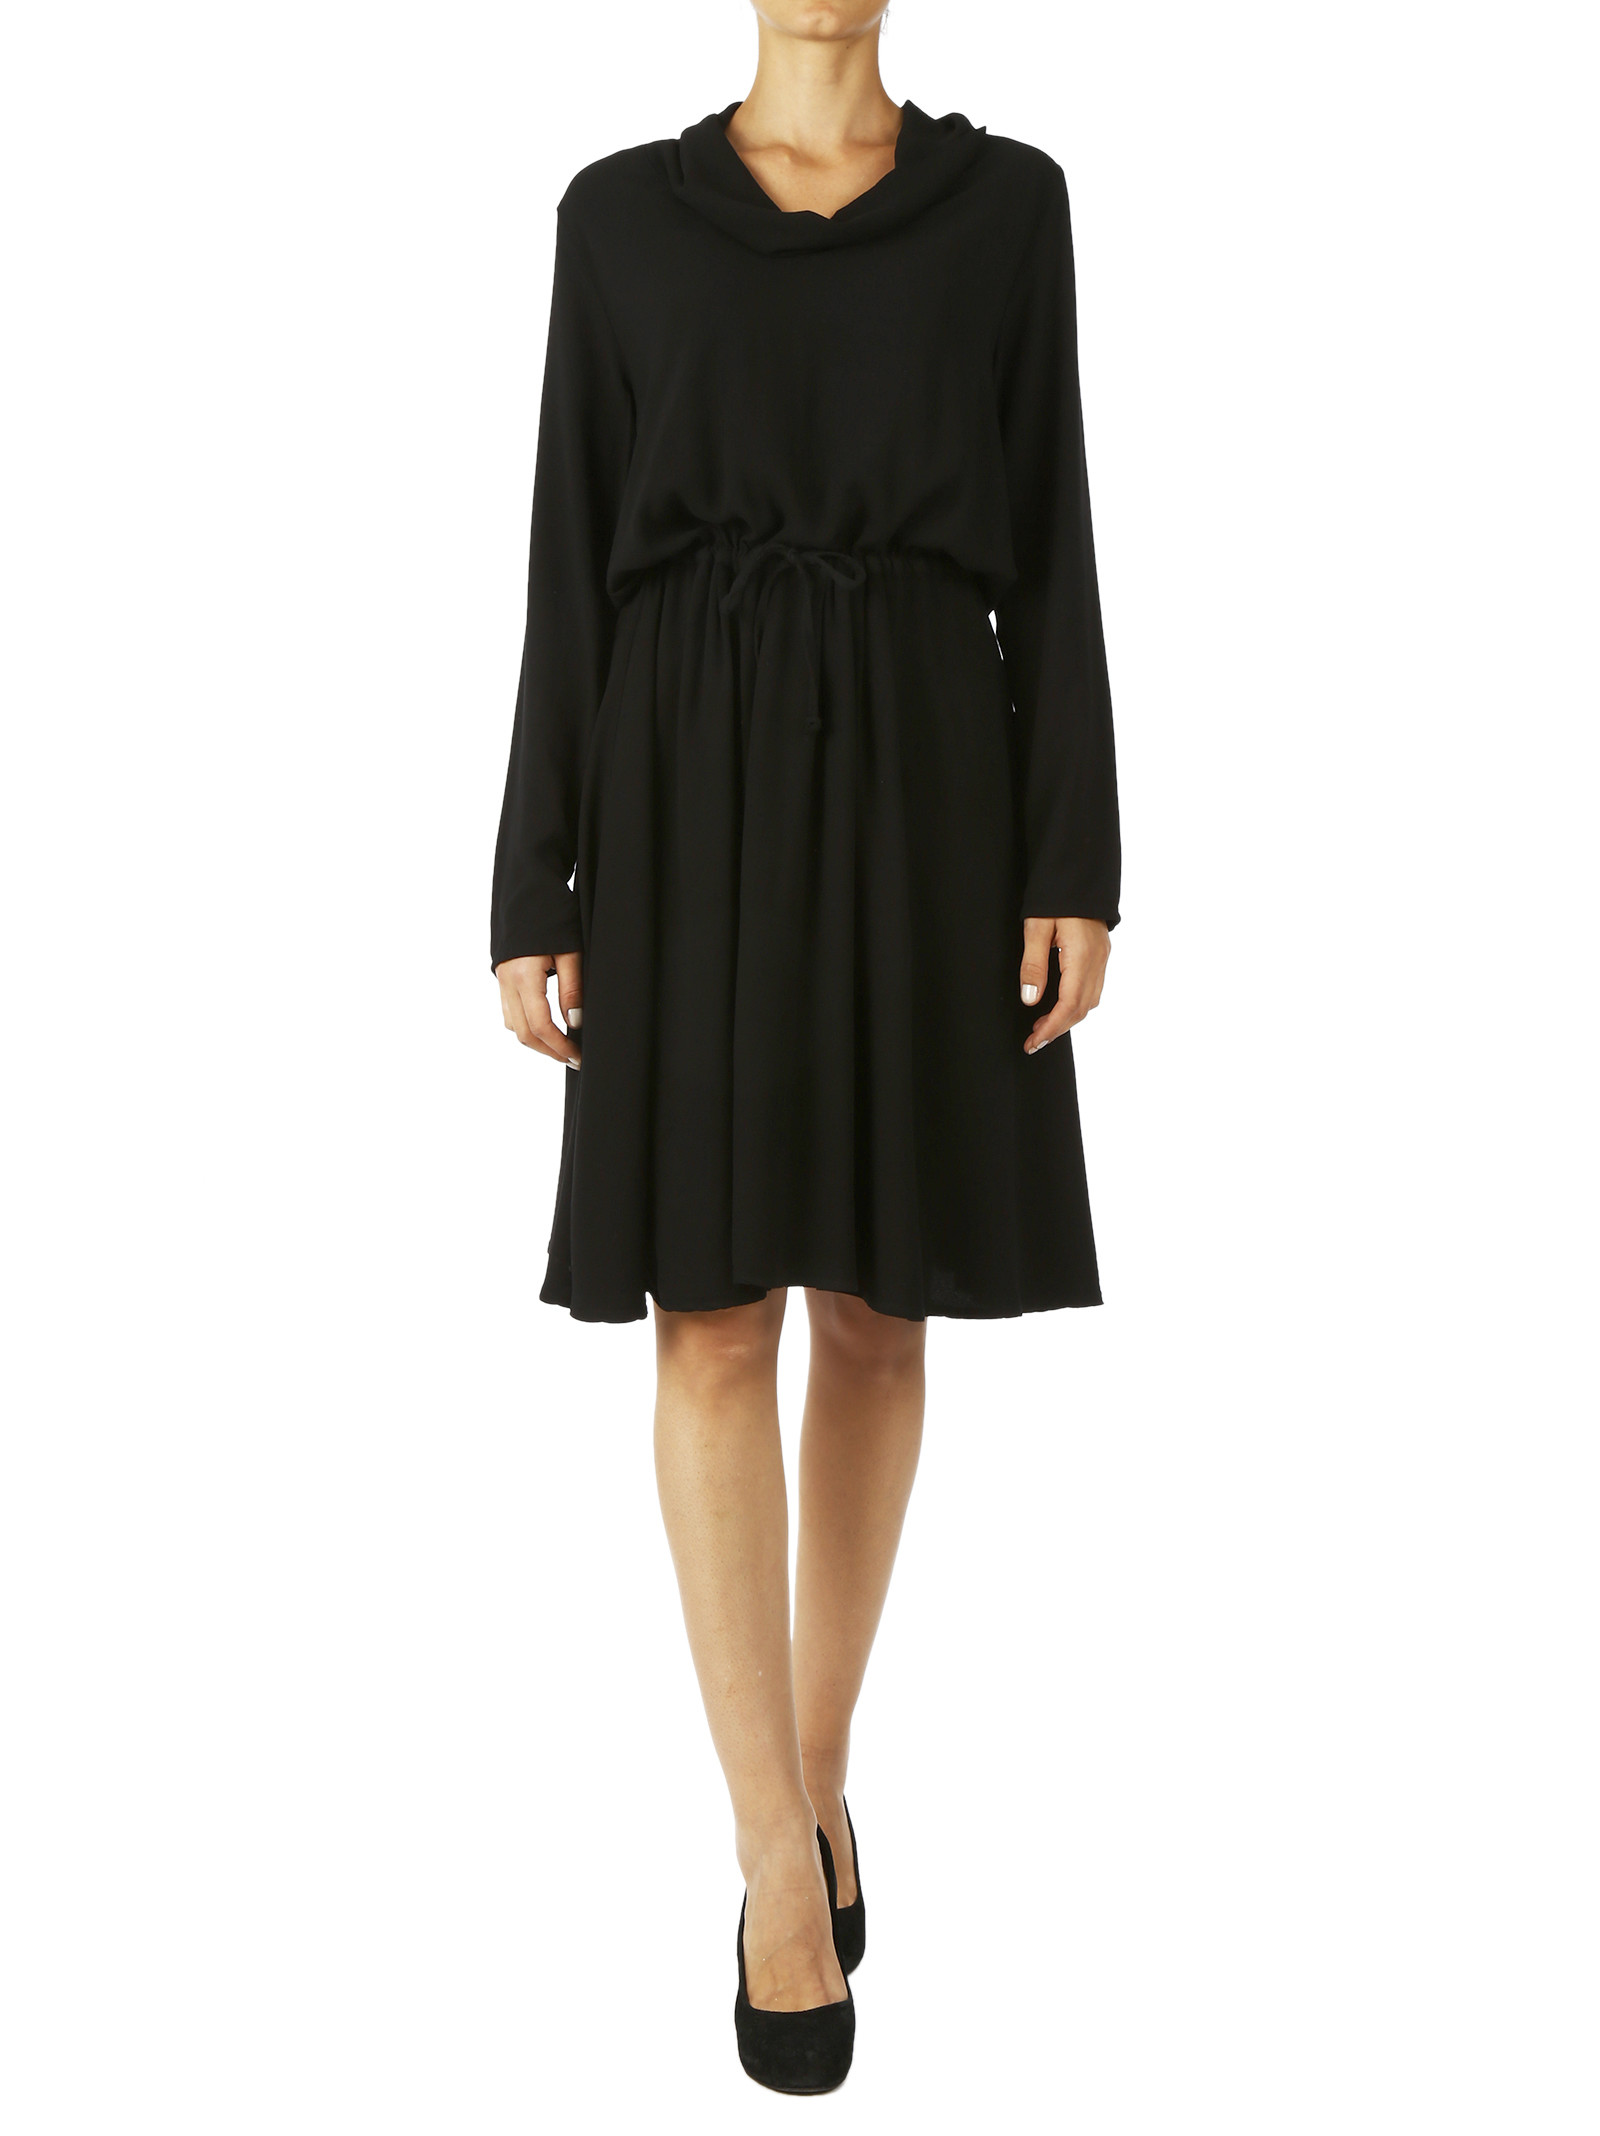 Altalana 100% Viscose Extrafine Coulisse Dress